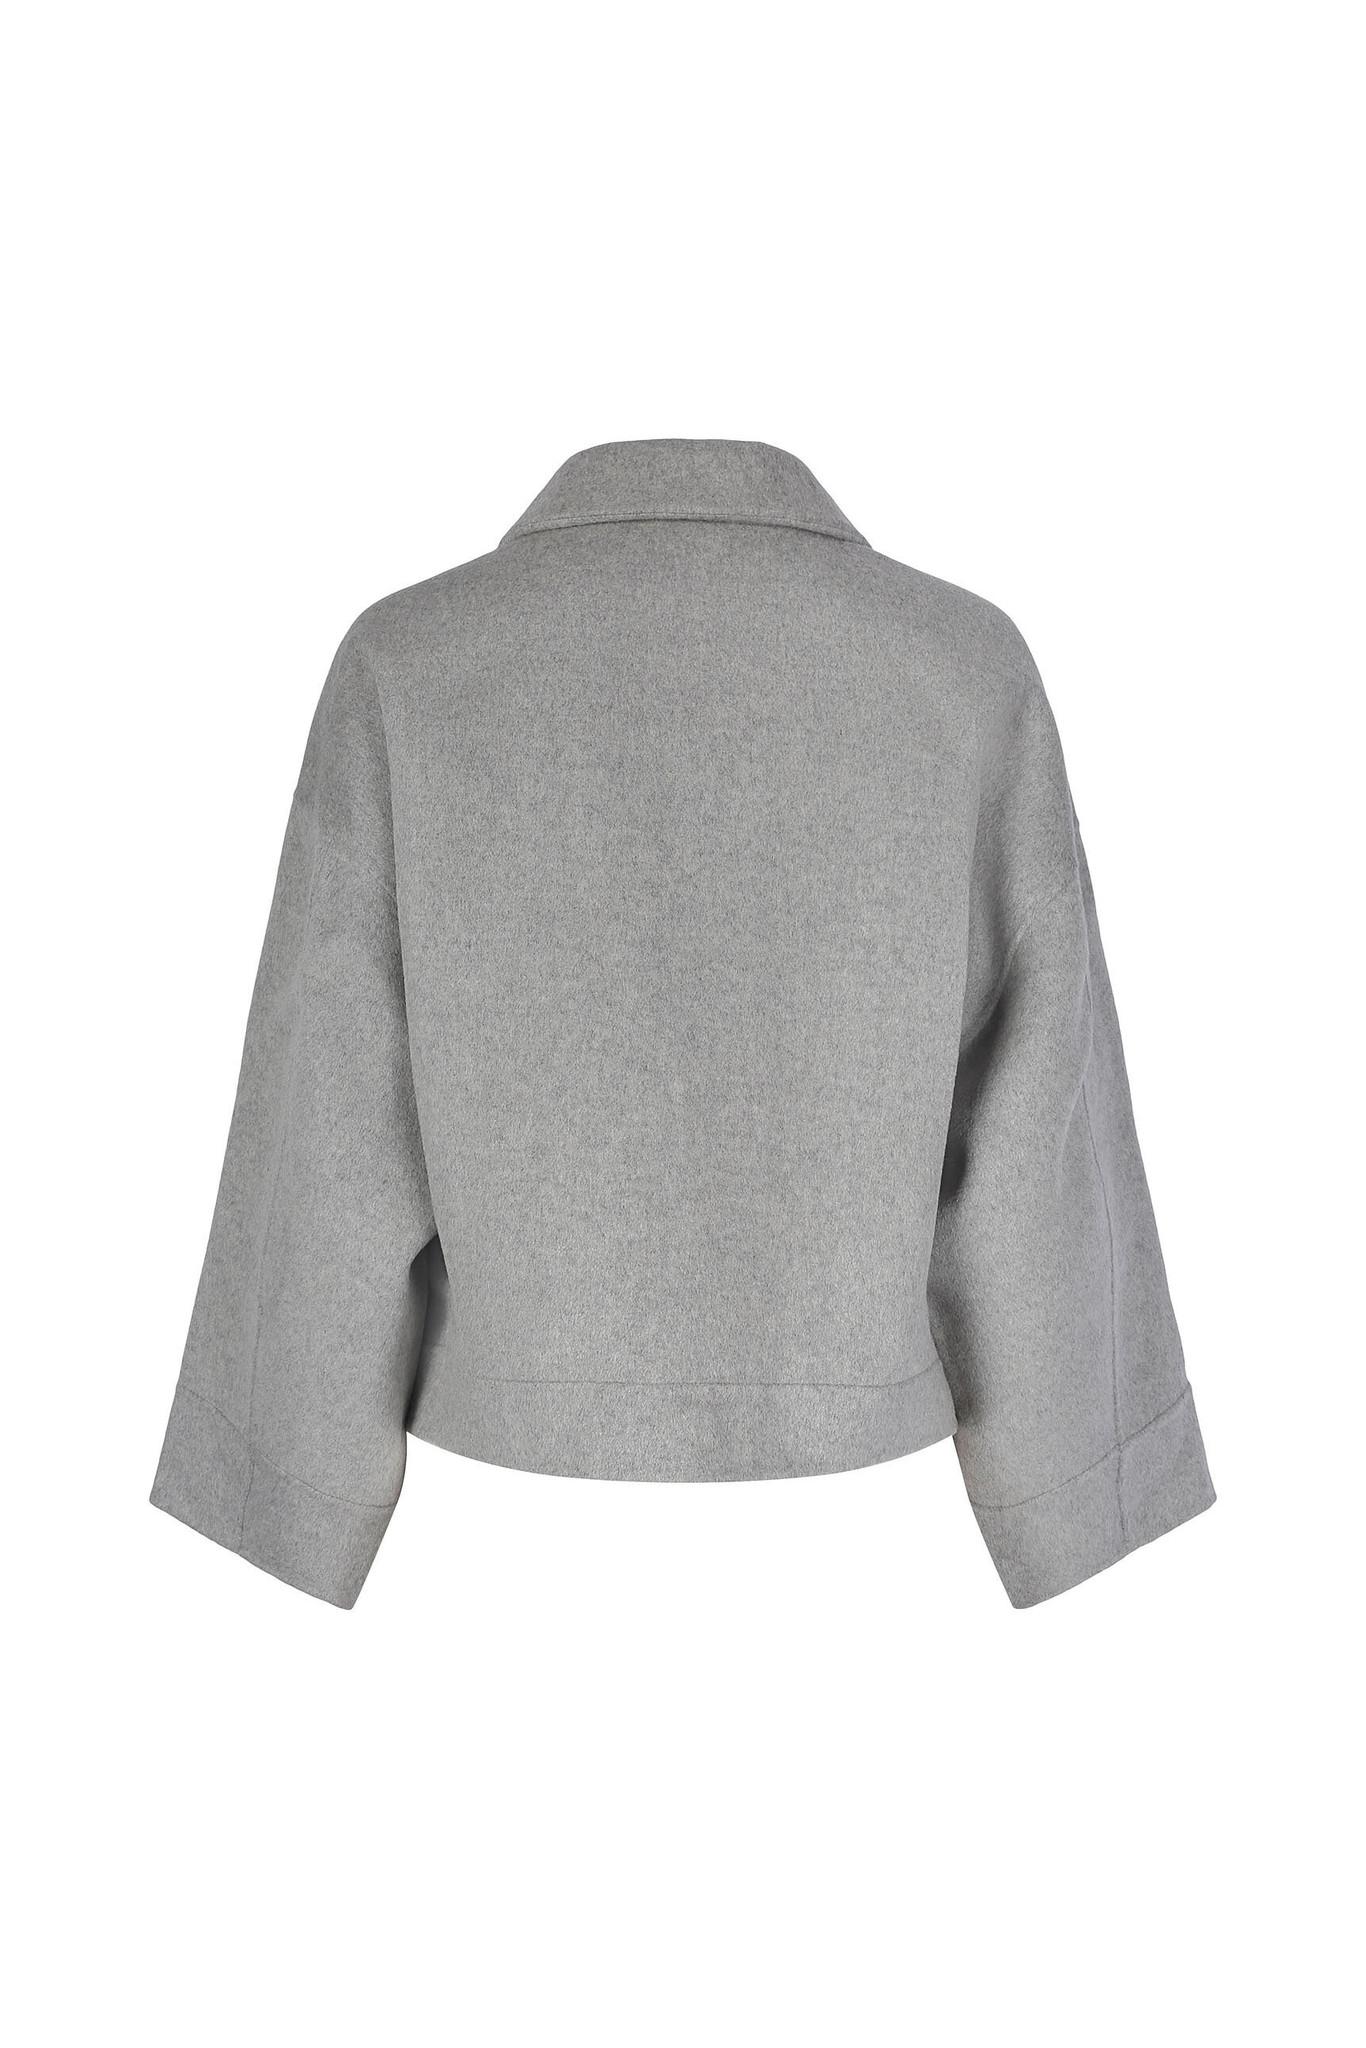 Andy Wool Jacket - Light Grey XS-3